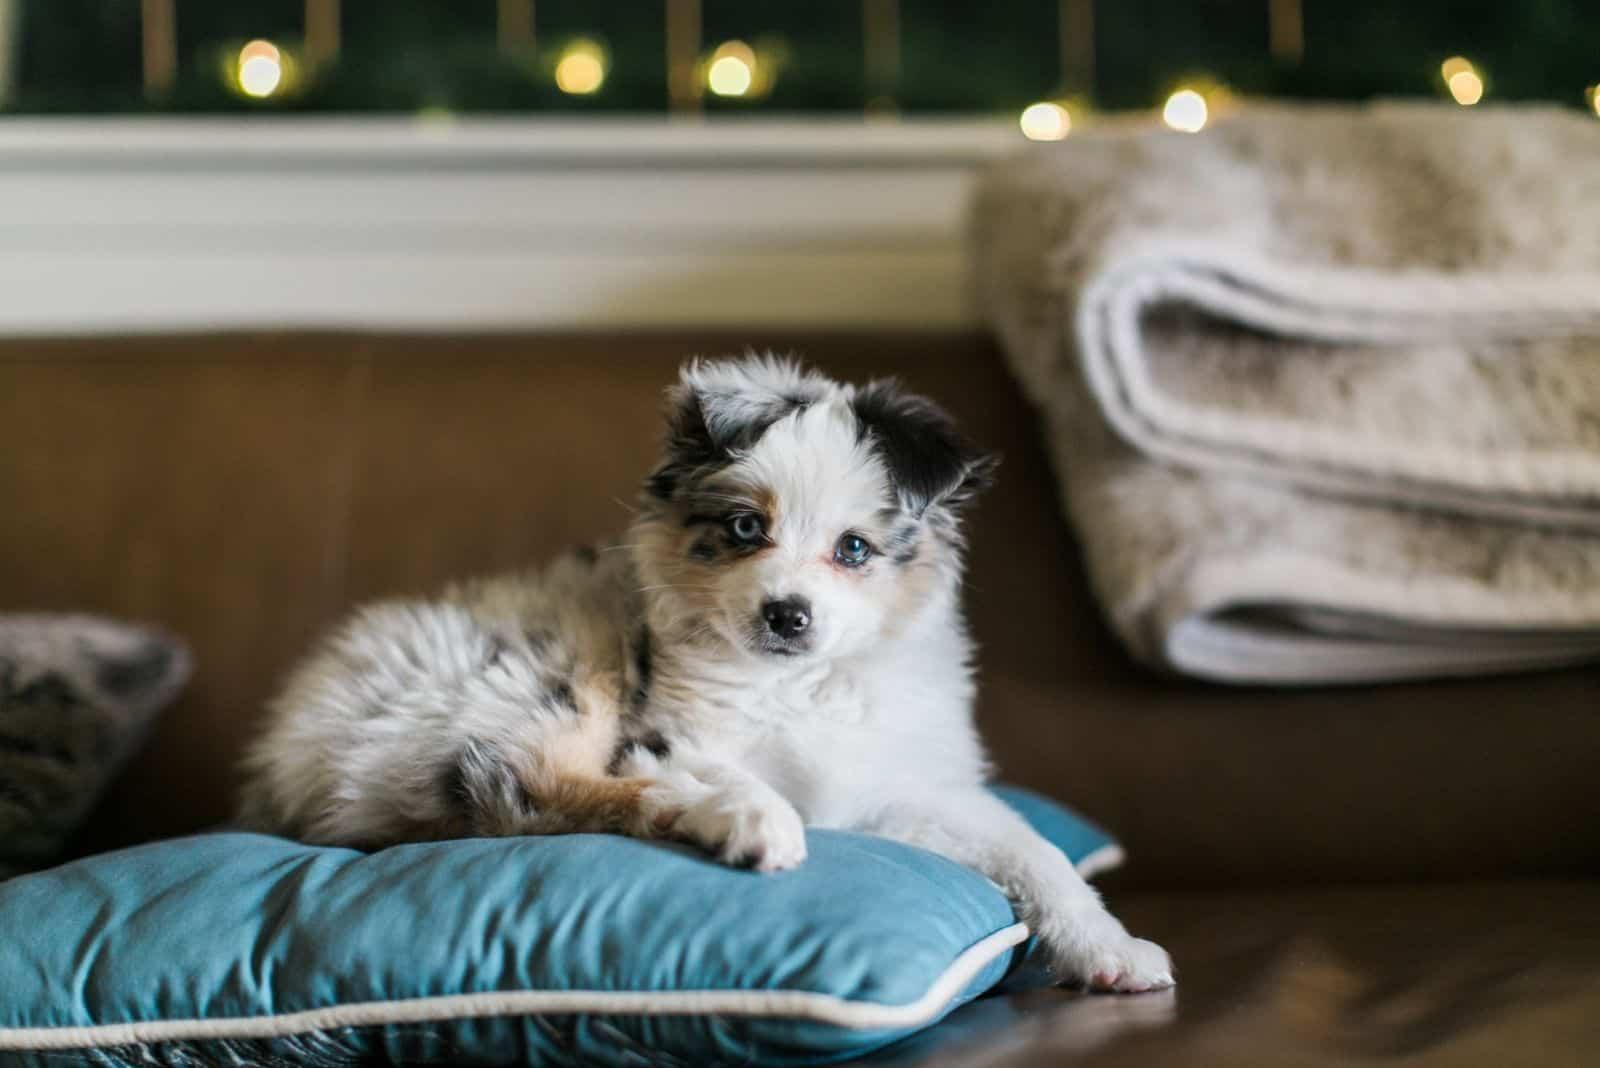 toy merle aussie shepherd dog lying on a blue pillow